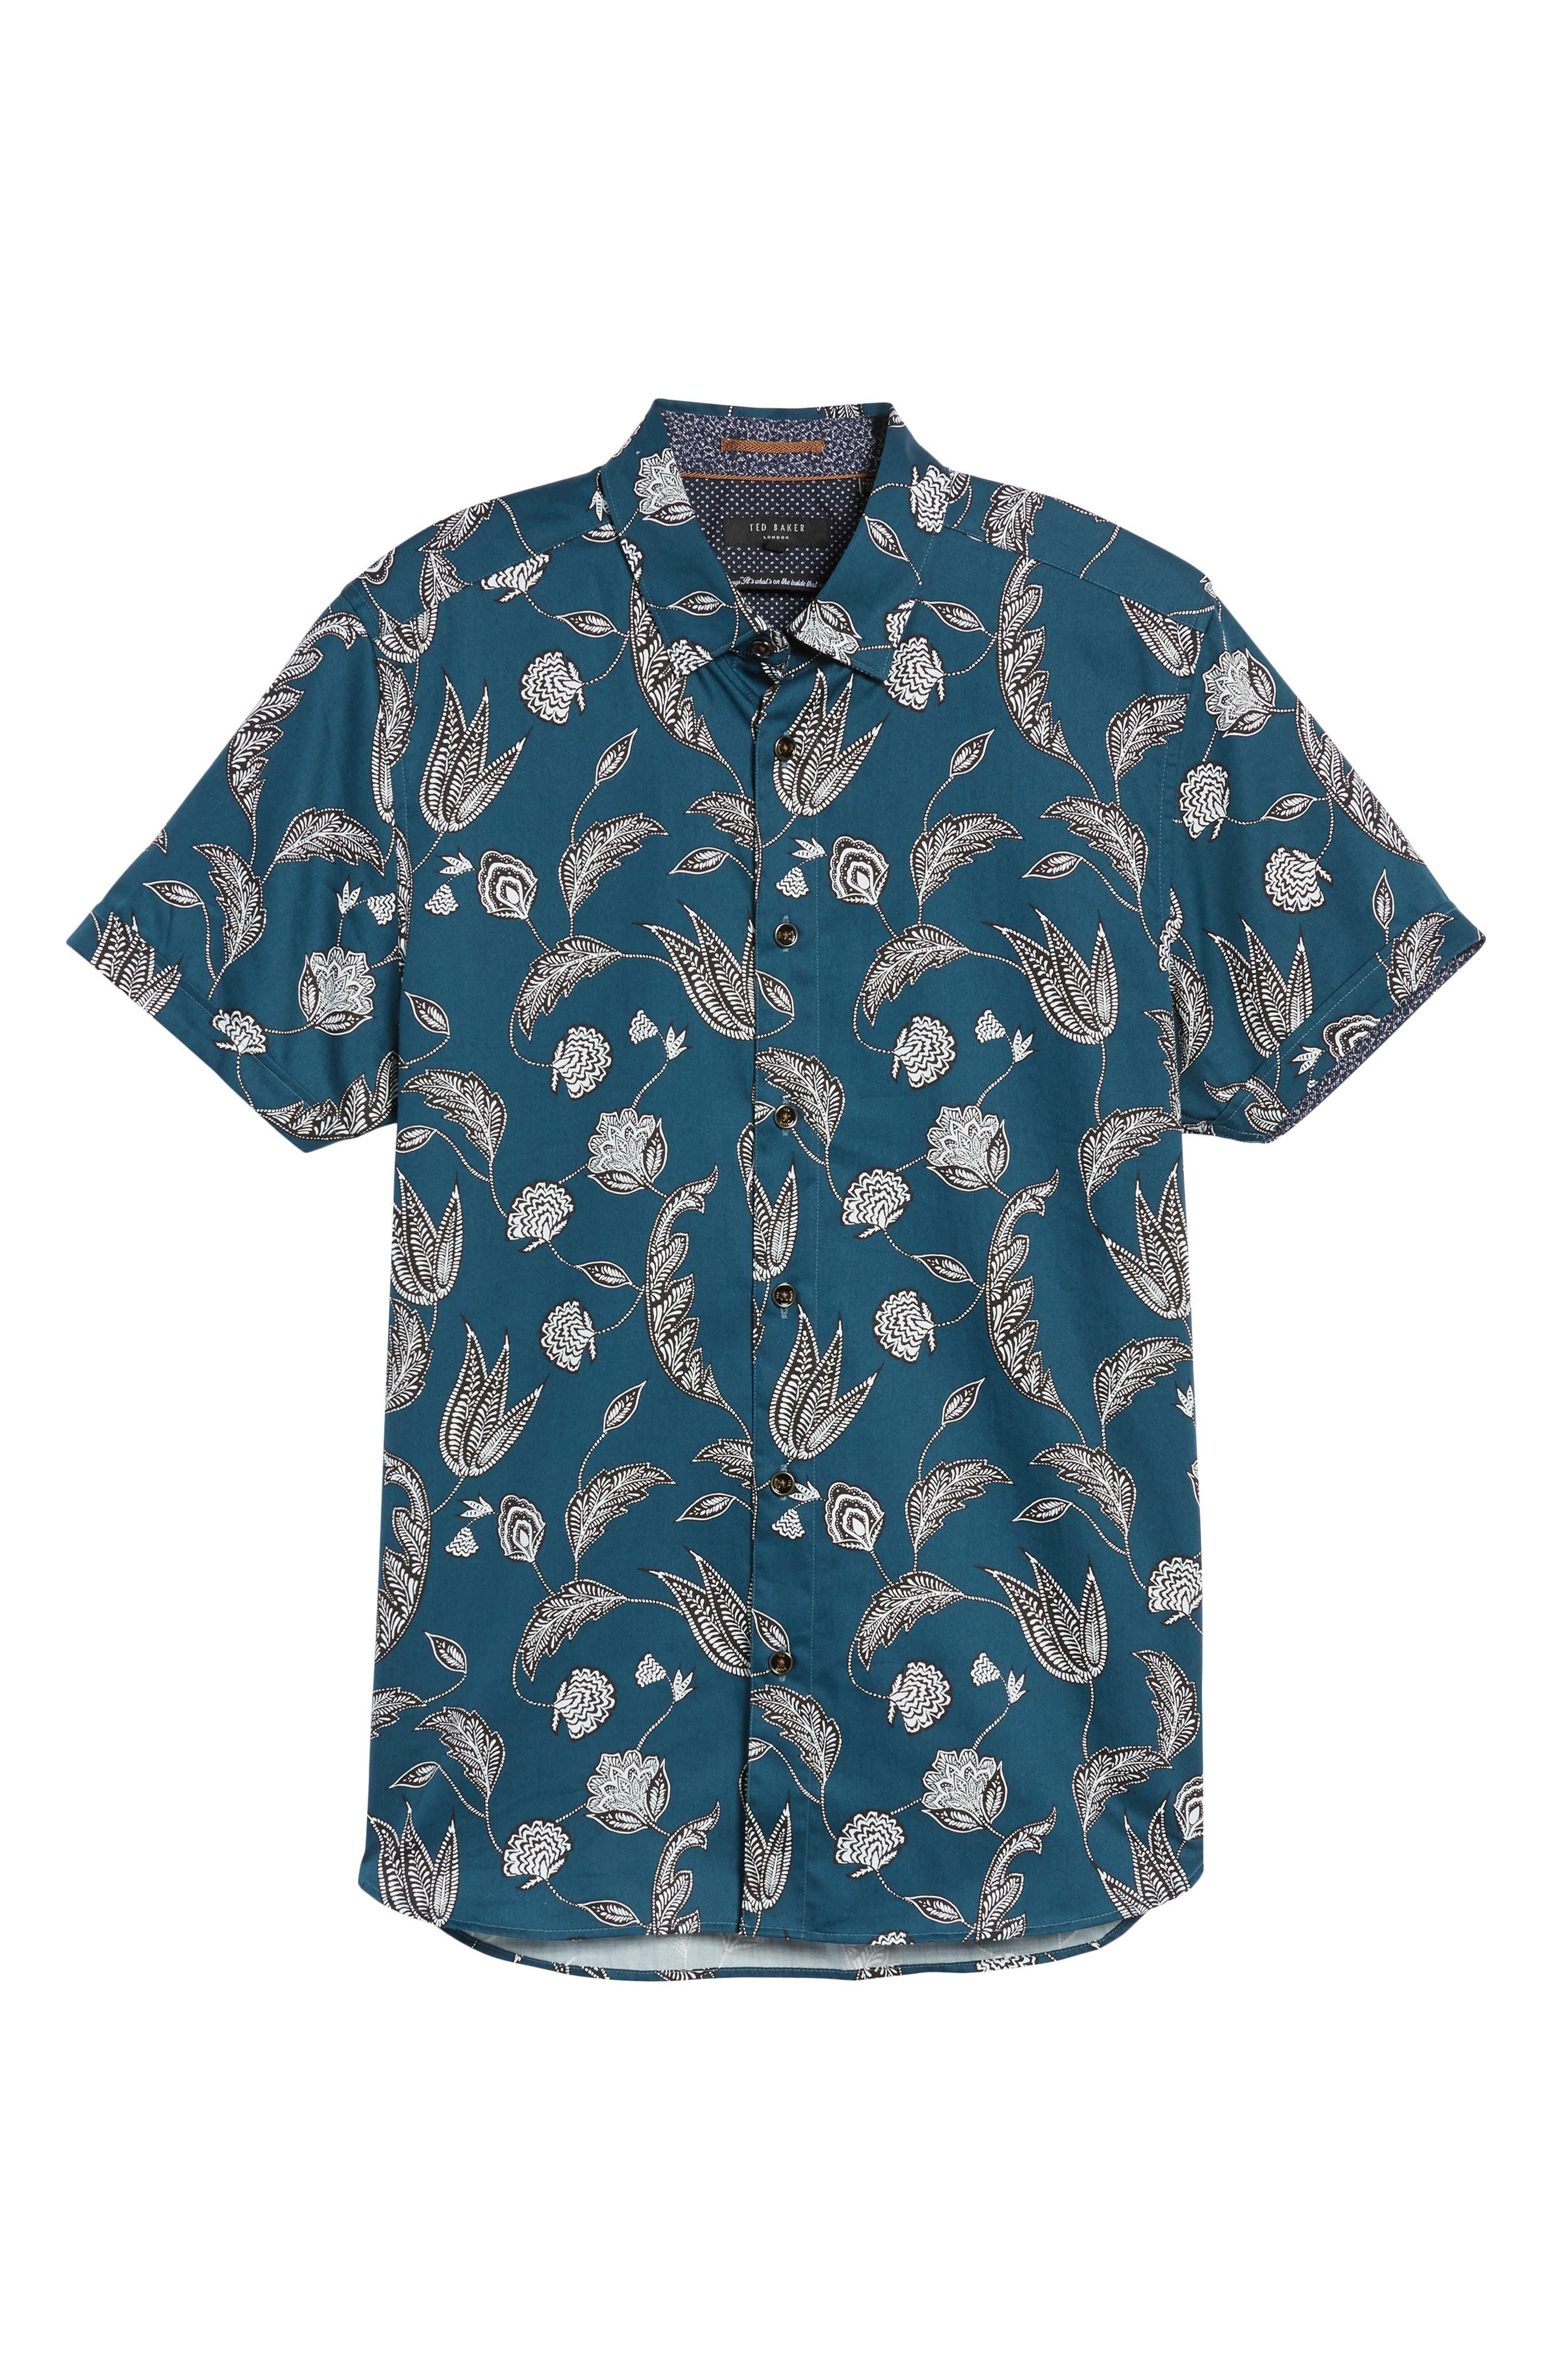 UTKU Floral Sport Shirt,                             Alternate thumbnail 11, color,